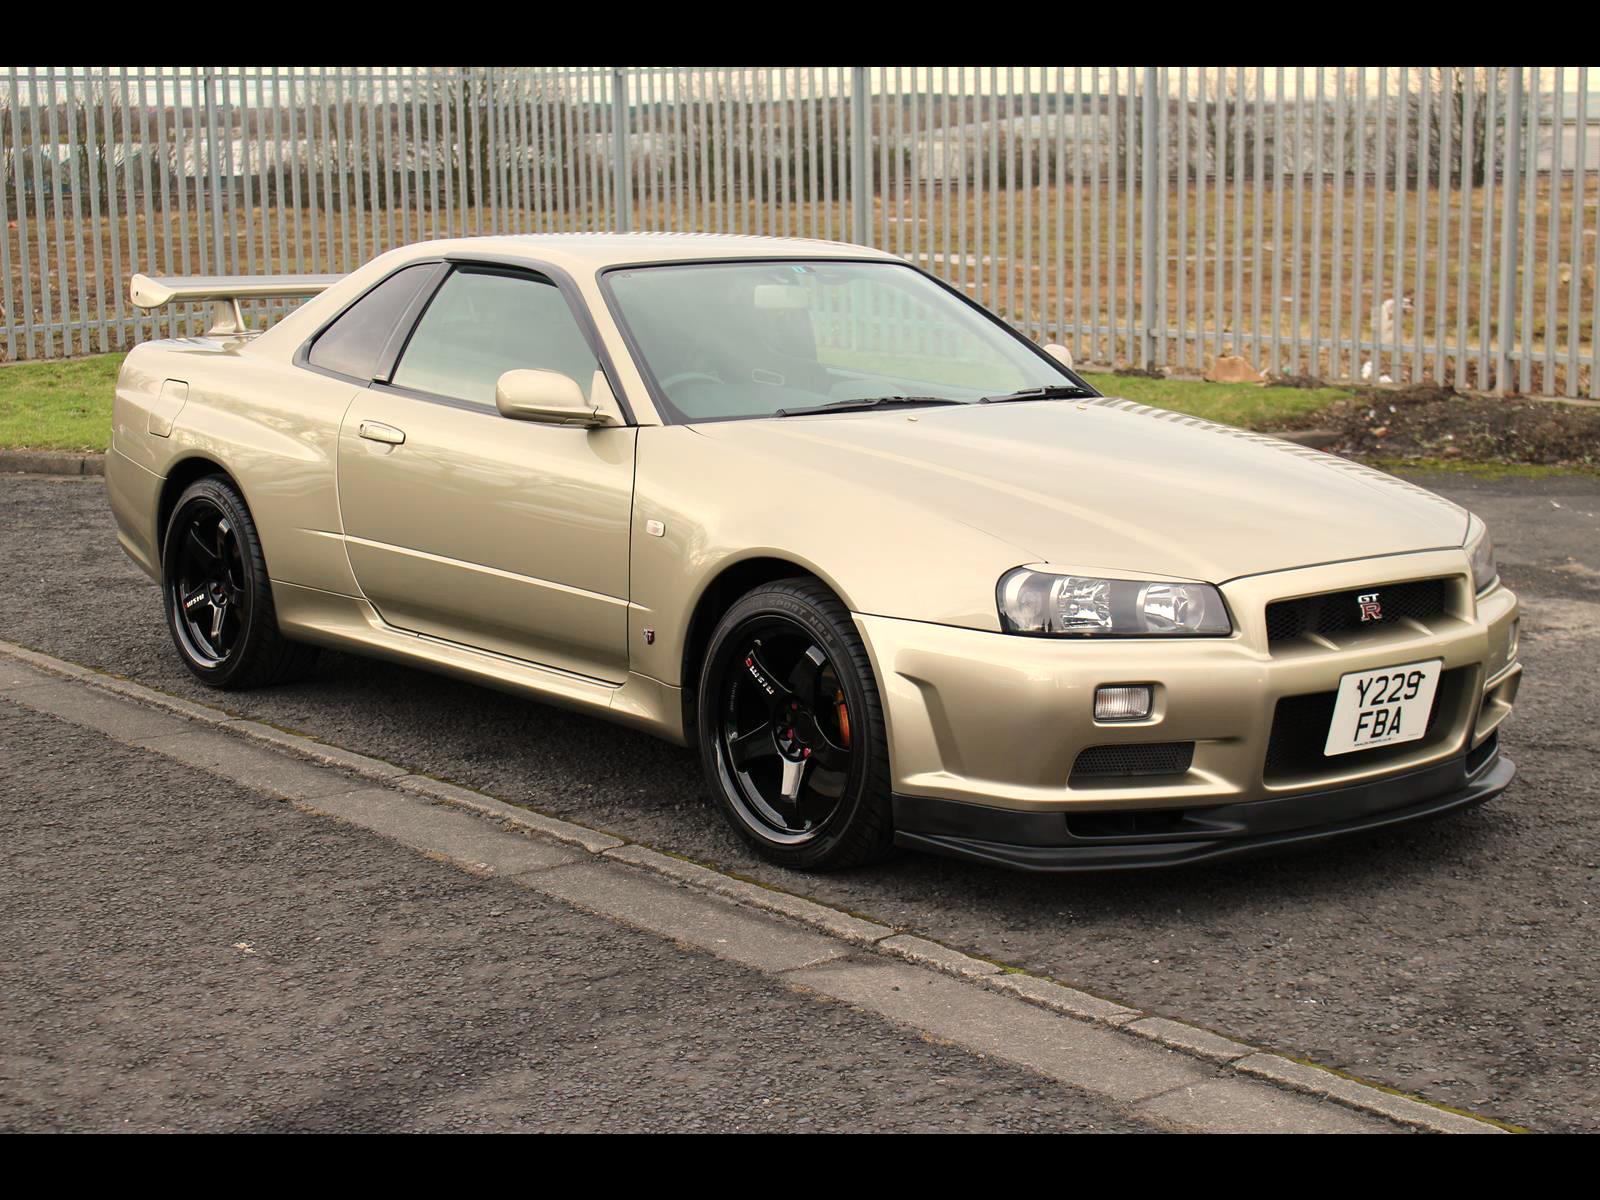 2001 Nissan Skyline R34 Gtr M Spec 1 Of 228 Produced